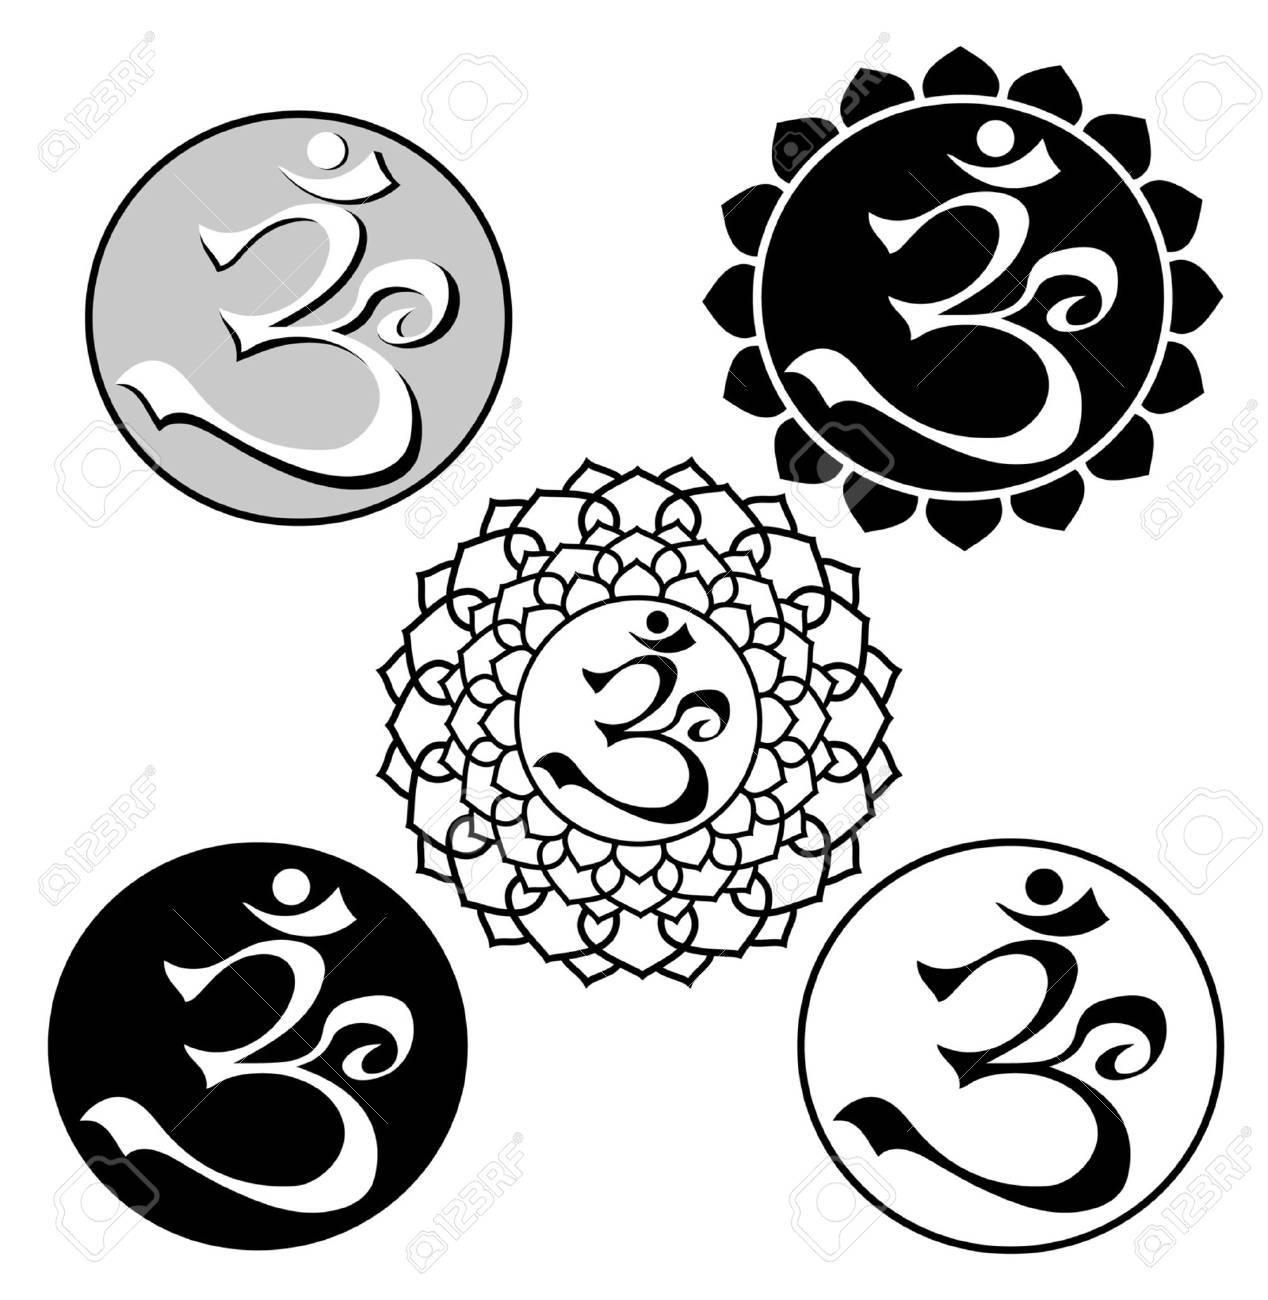 image of aum symbol Stock Vector - 15809669